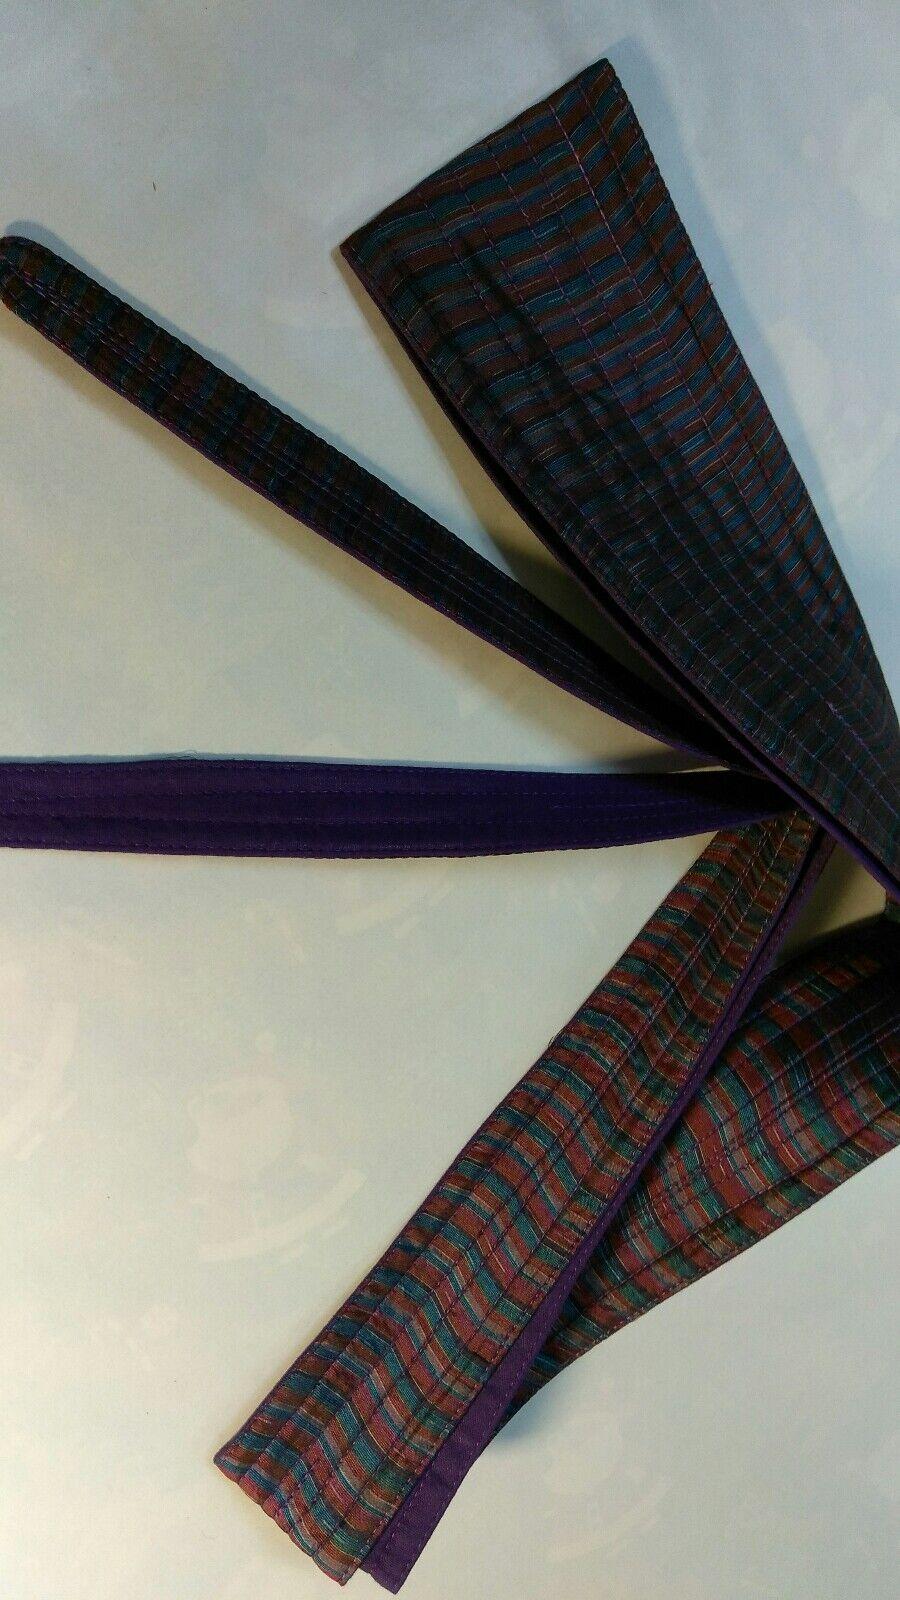 BOHO 70s treasure 100% pure silk / cotton lining sash long belt UNISEX COSPLAY